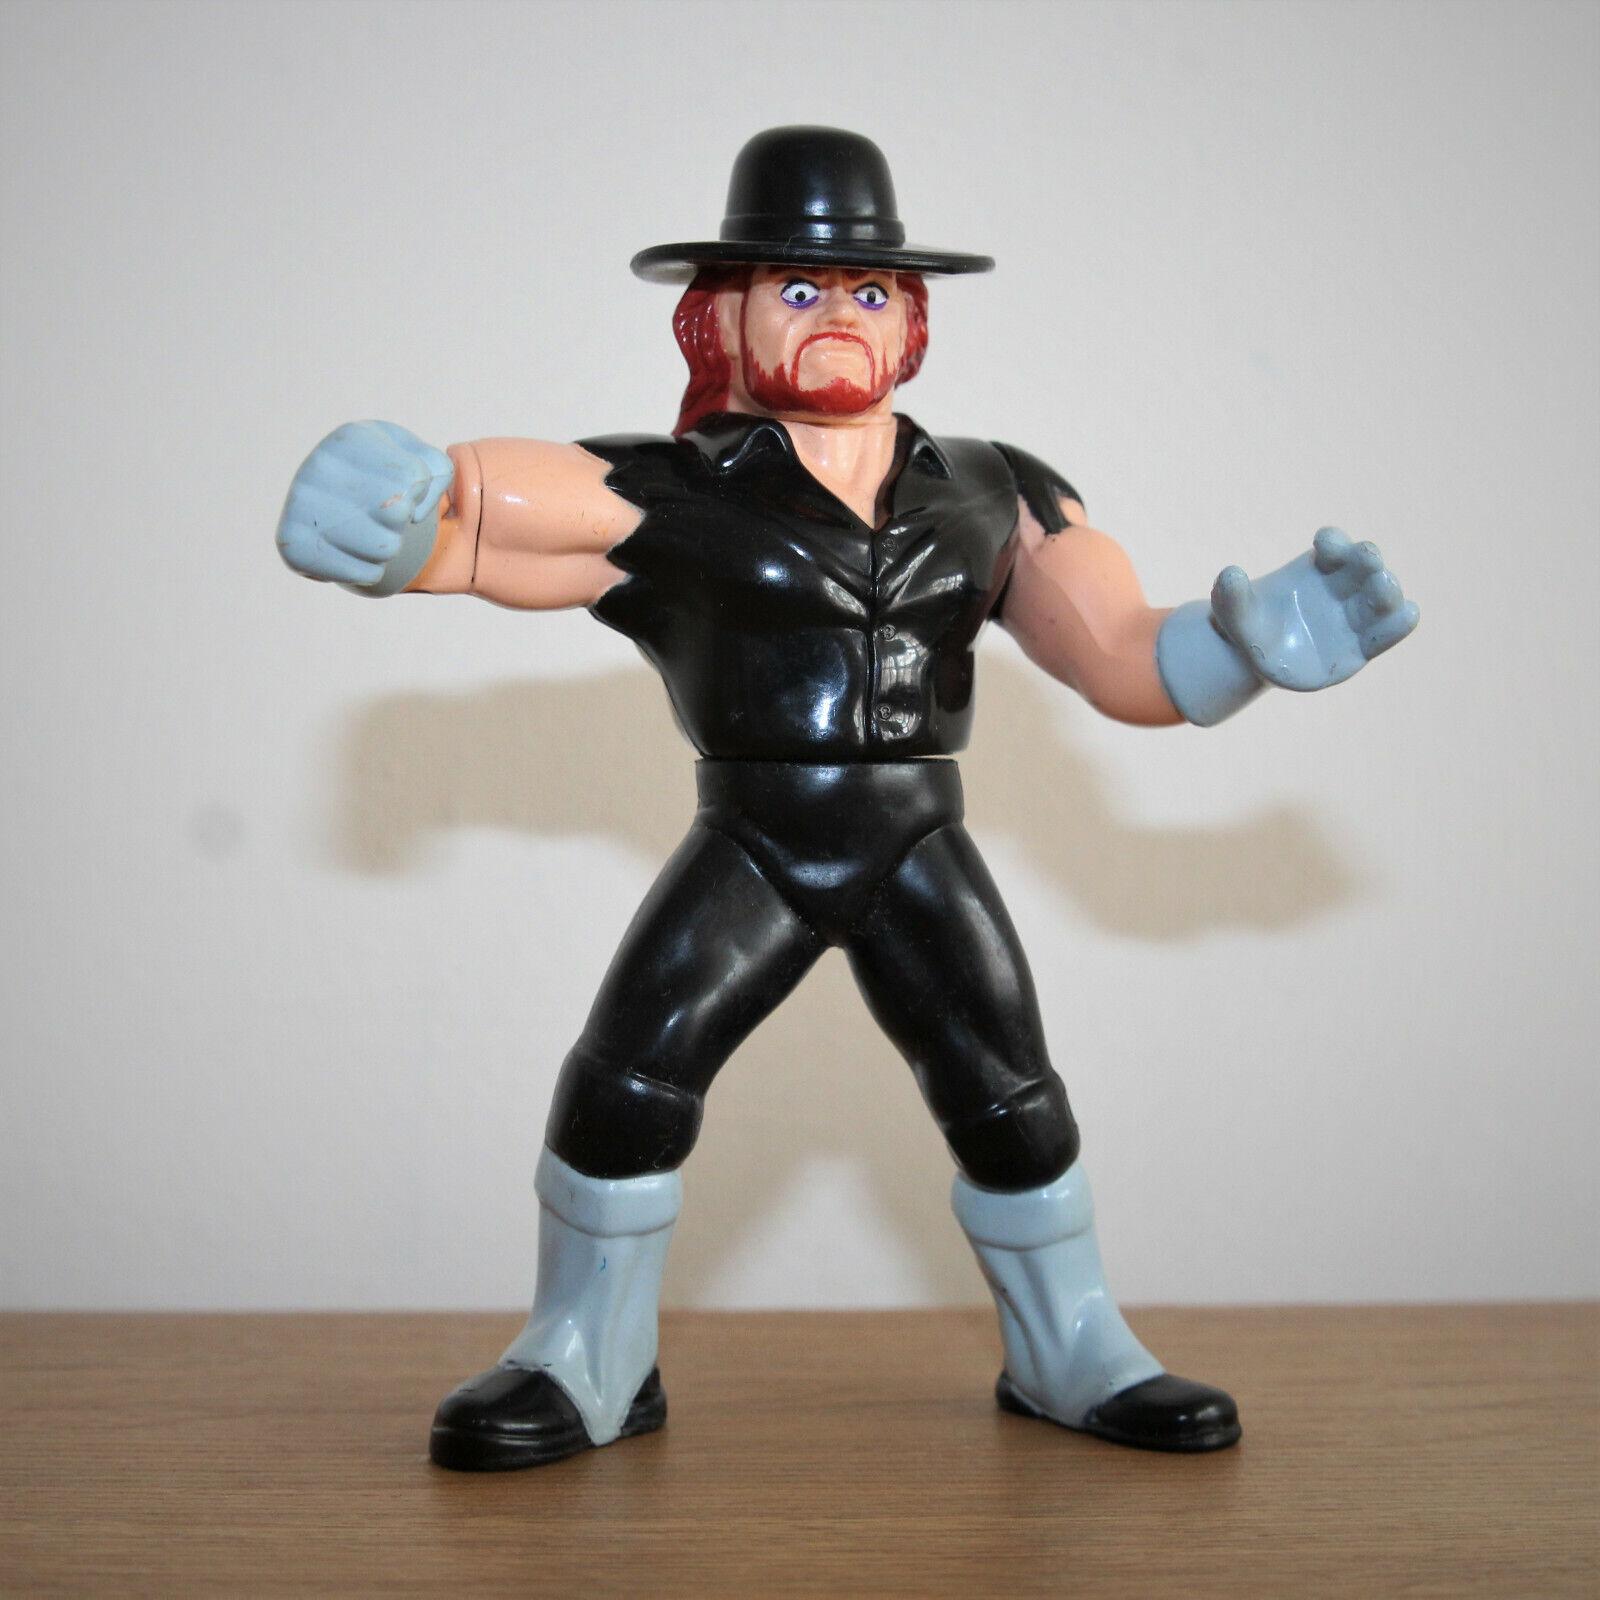 WWF-LE POMPE divertiessitoEBRI-Hasbro-Titan sportivo-Vintage Wrestling cifra-WWE